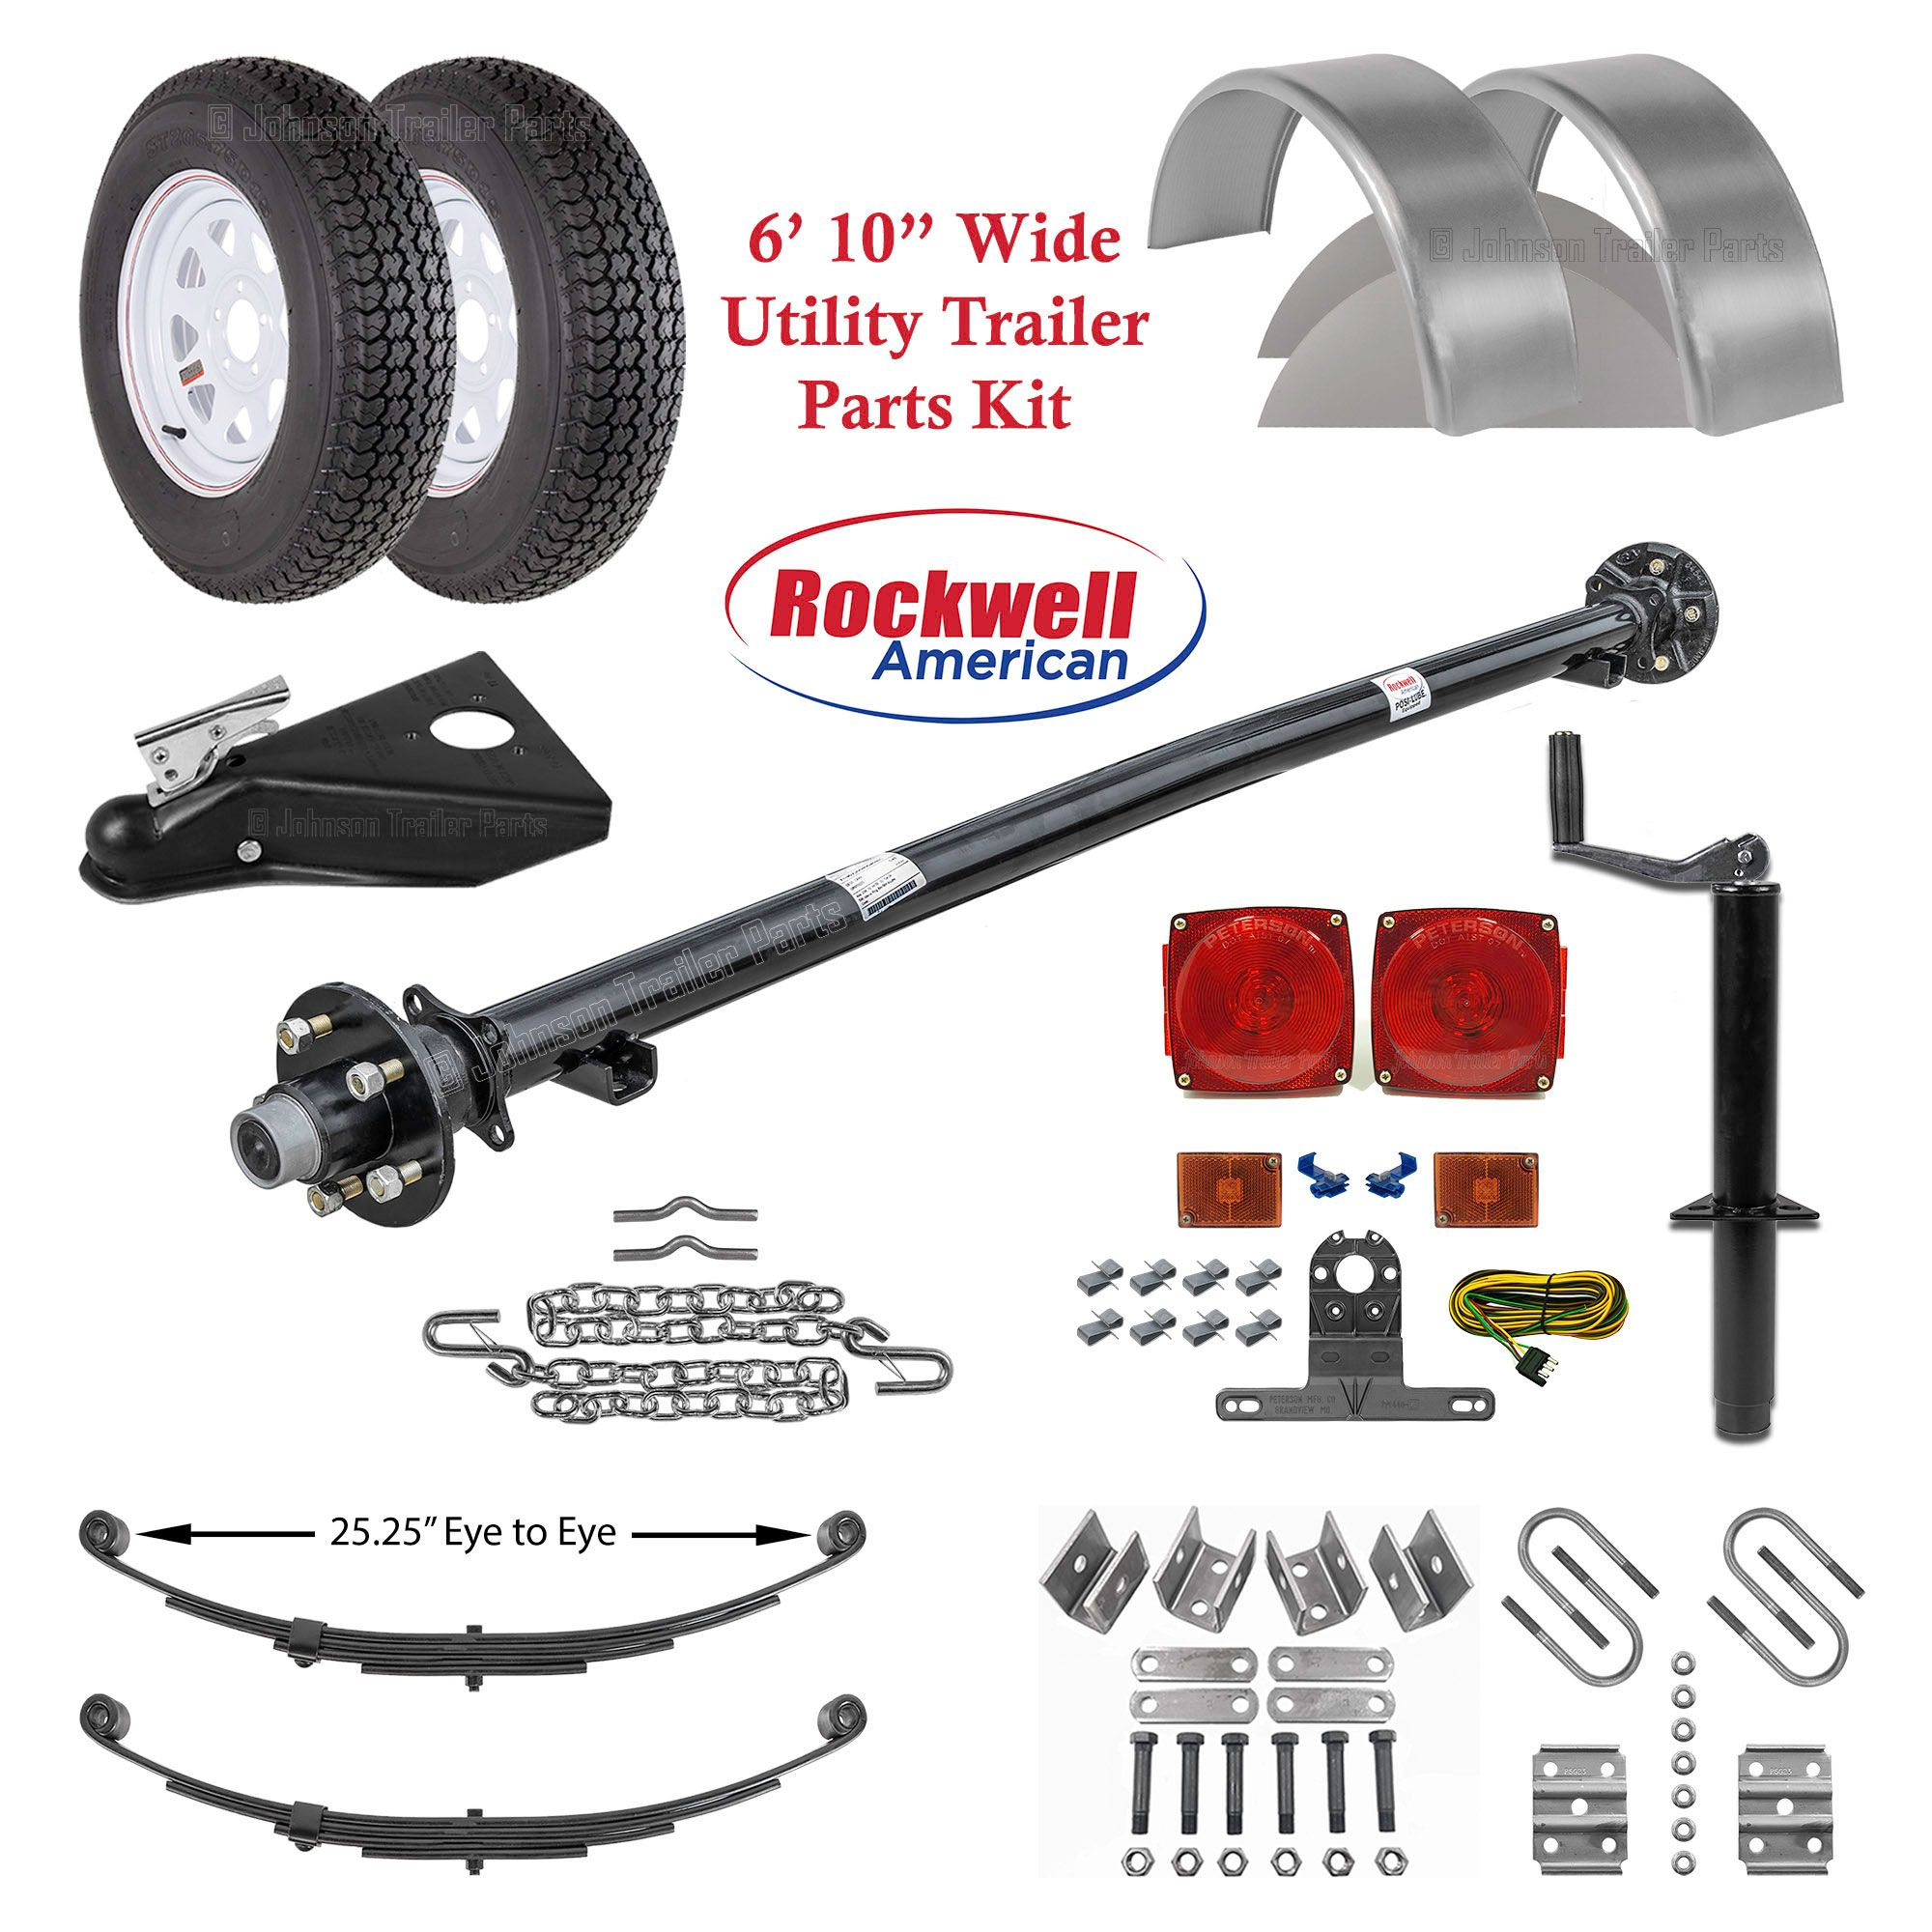 6ft 10in Utility Trailer Parts Kit 3 500 Lb Capacity Utility Trailer Utility Trailer Parts Utility Trailer Kits